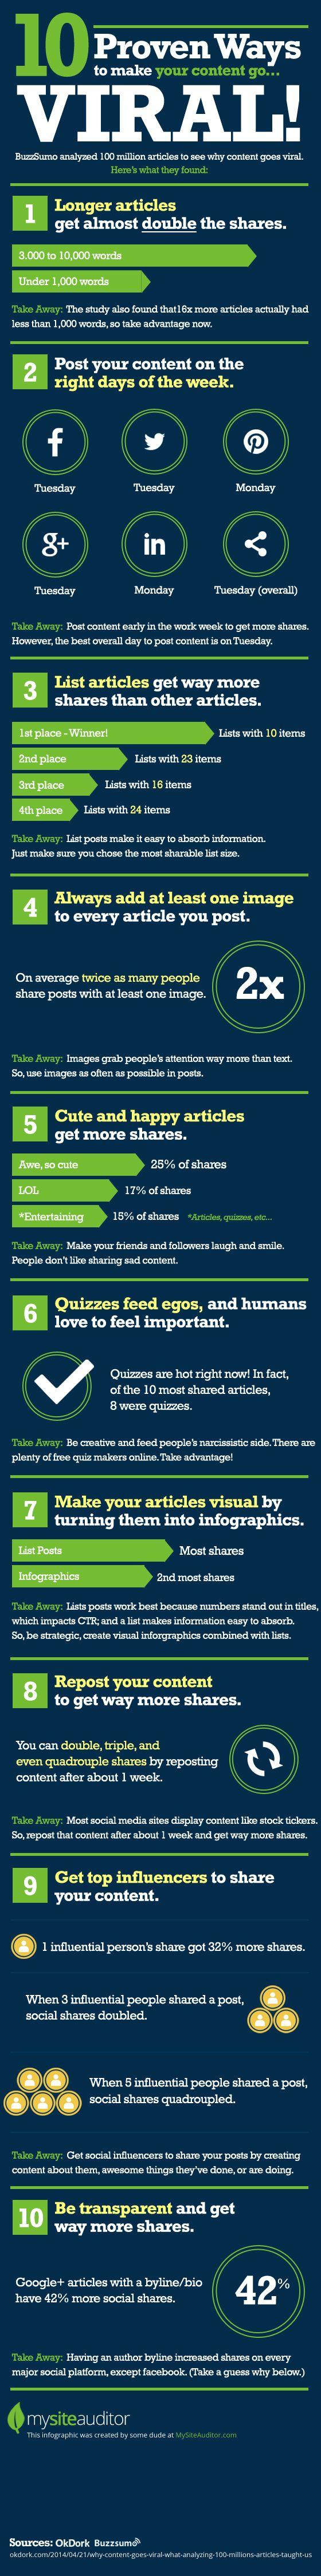 10 Proven Ways to Make Content Go Viral #infographic #SocialMedia socialmediatoday.com